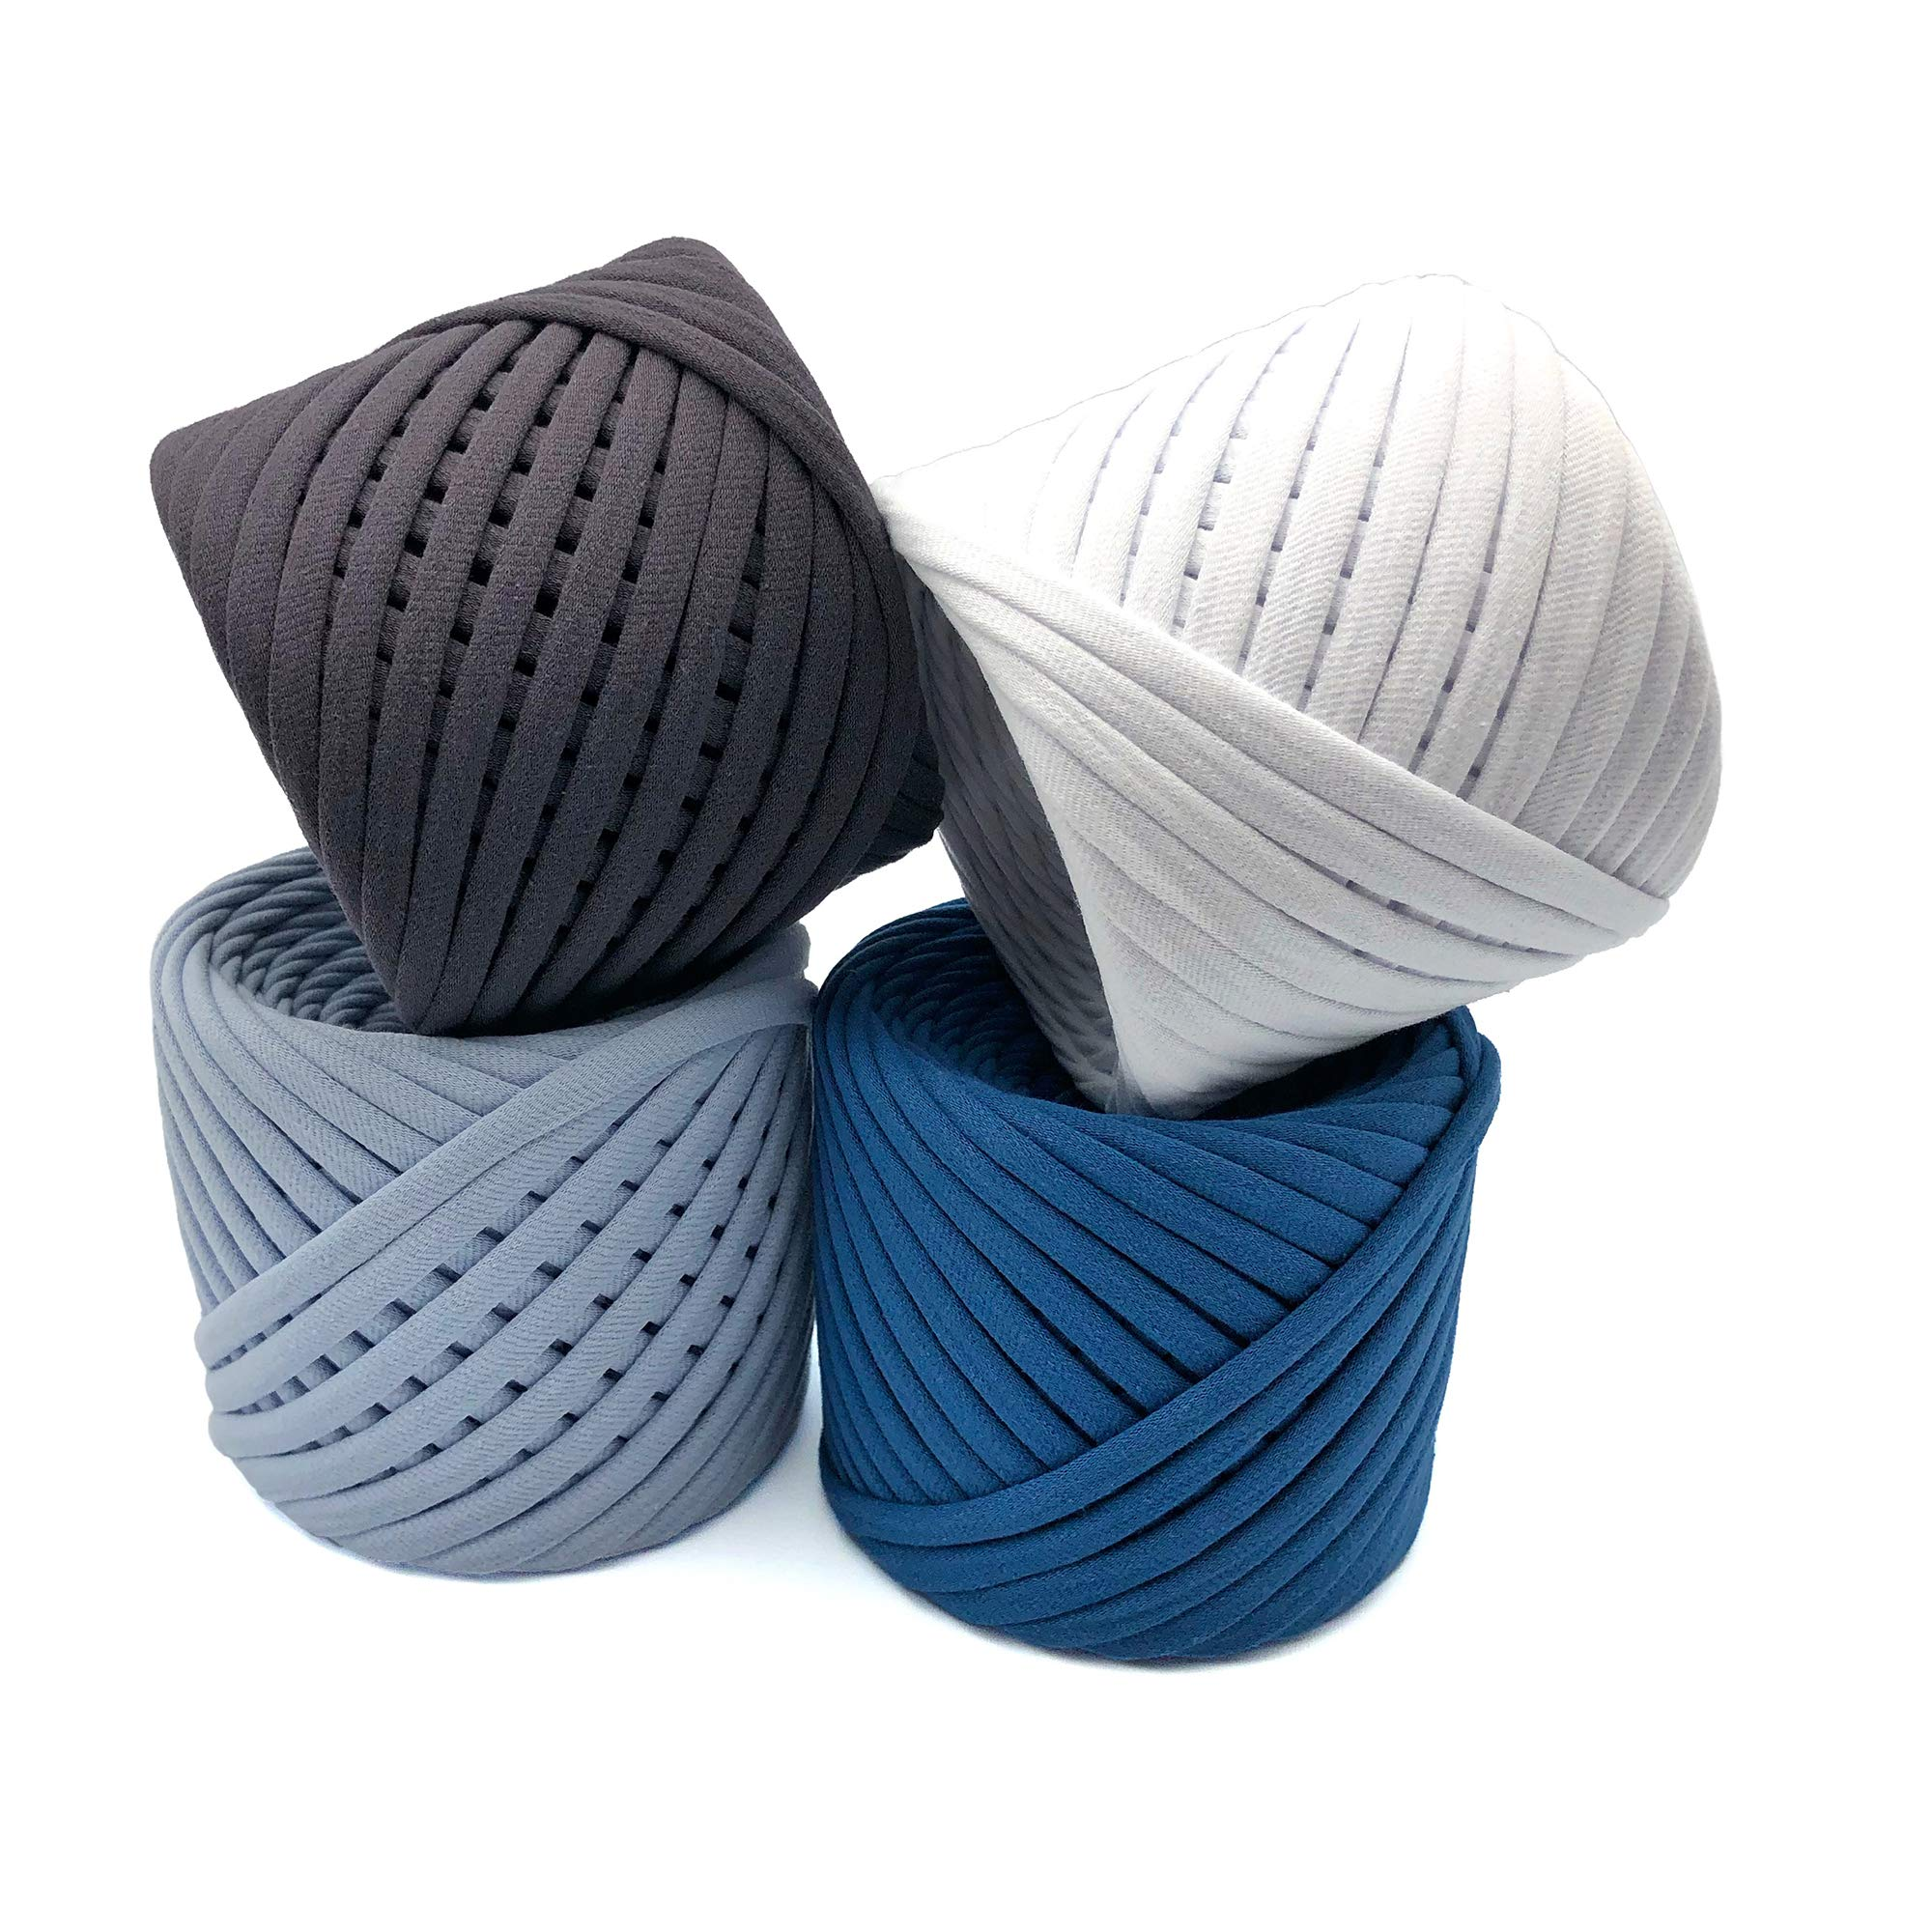 T-Shirt Yarn Fettuccini Zpagetti Set - 4 Balls Total of 218 Yards - Tshirt Yarn Kit for Crocheting - Ribbon Yarn 100% Cotton - Knitting Yarn Ball - T Yarn Organic - Macrame T-Yarn London